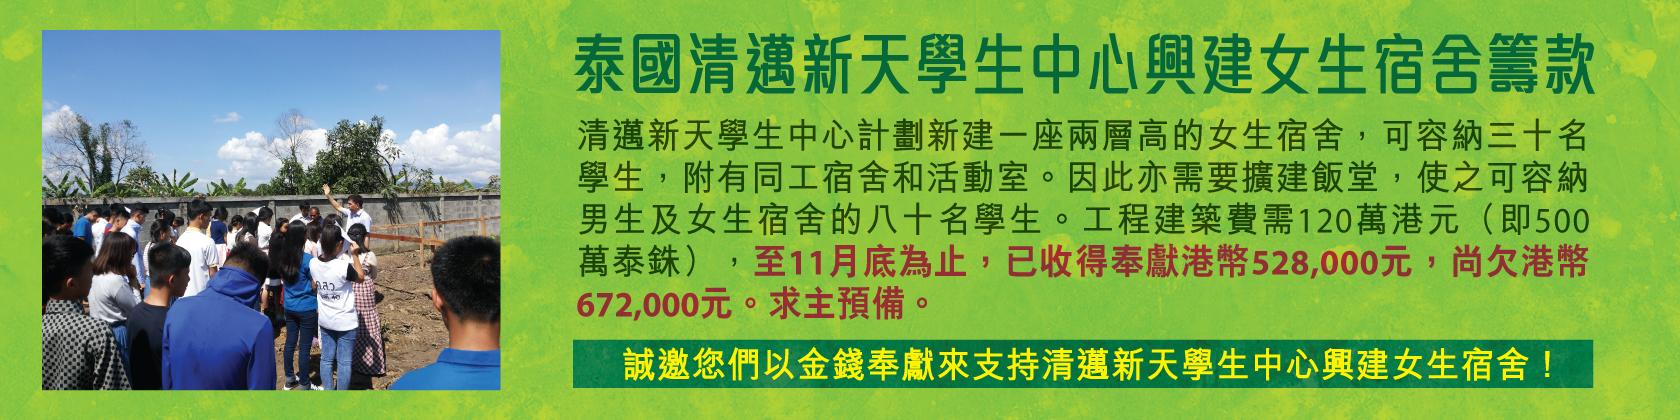 CB-02-web-banner-1680-x-420-016